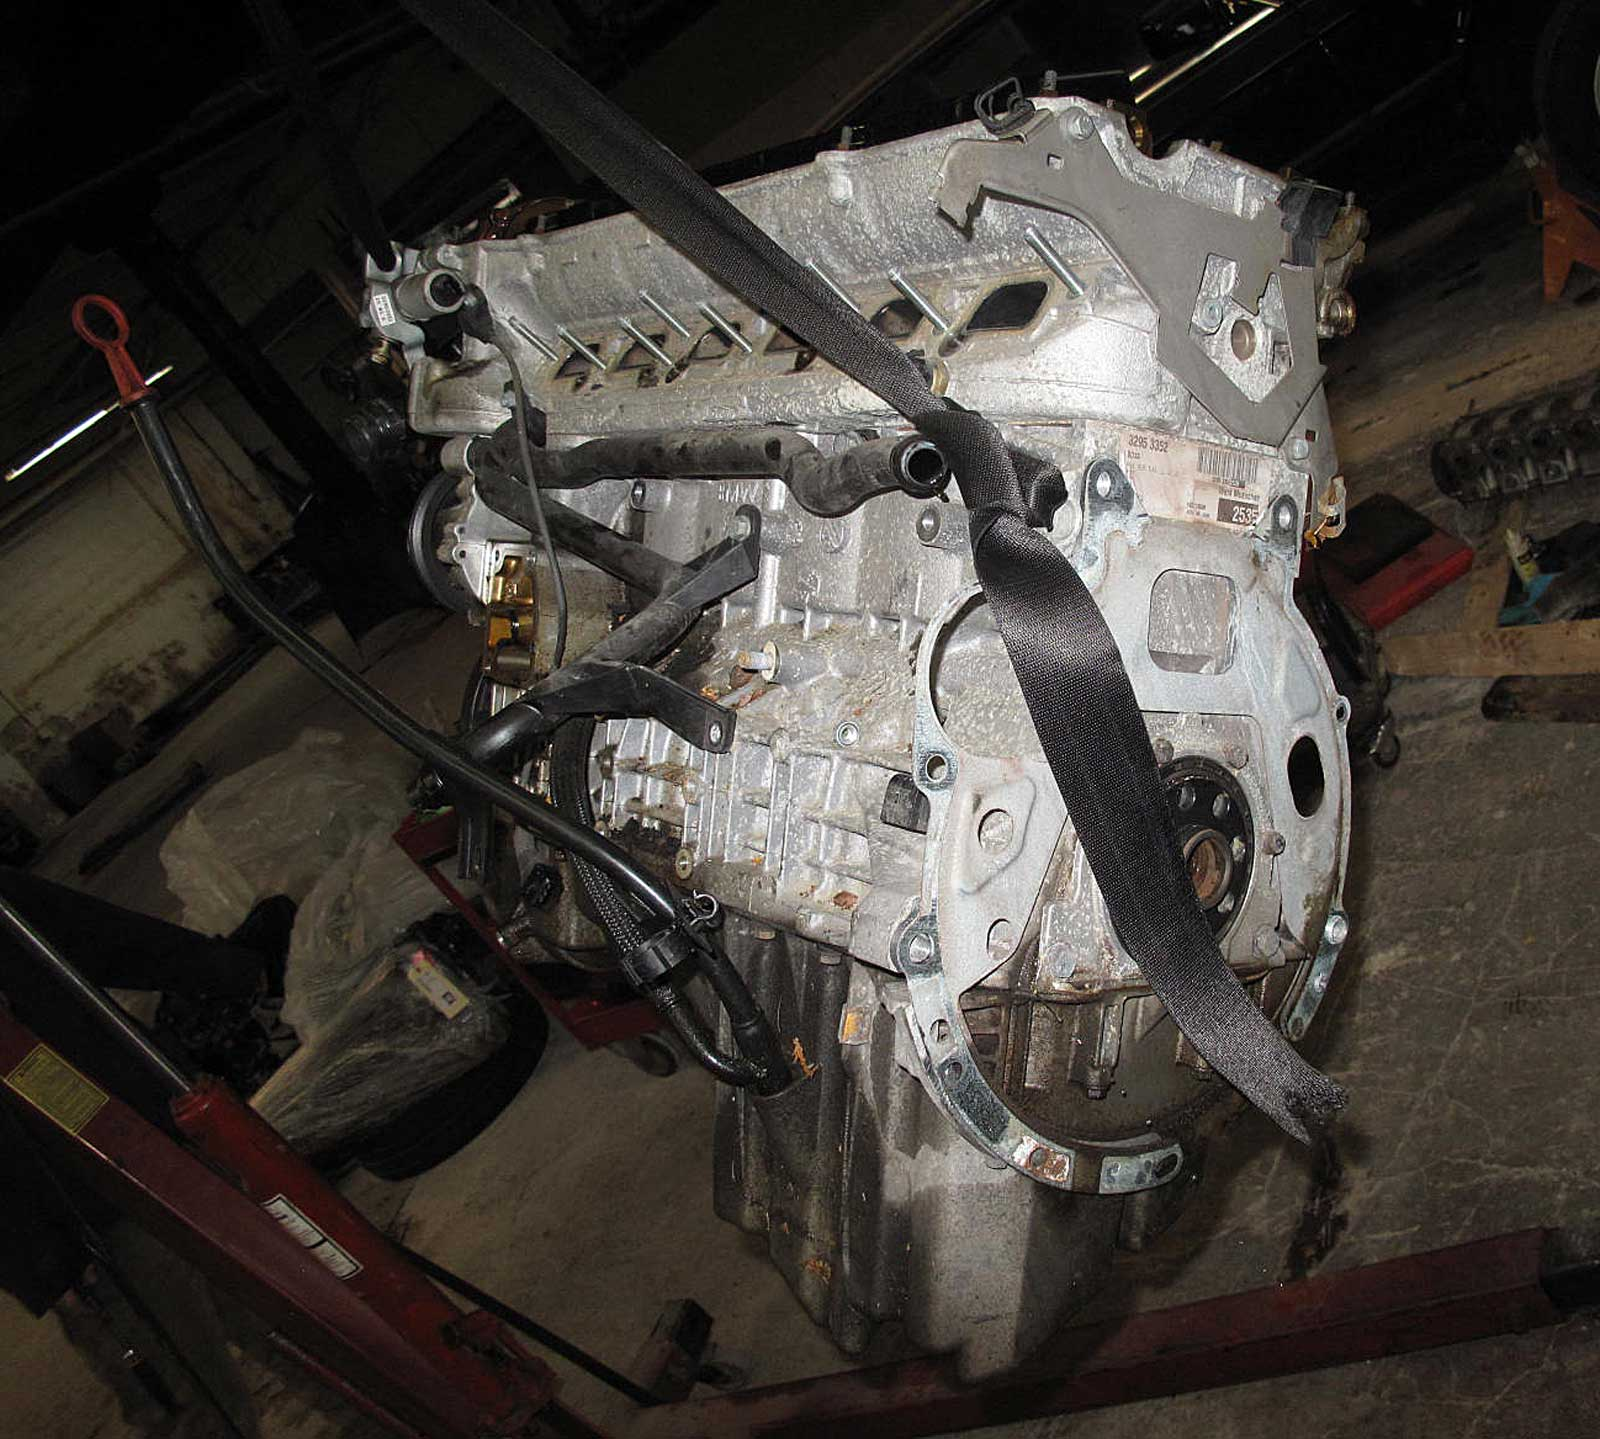 BMW E46 325i Z4 2.5i M54 2.5L 6-Cylinder Engine Assembly